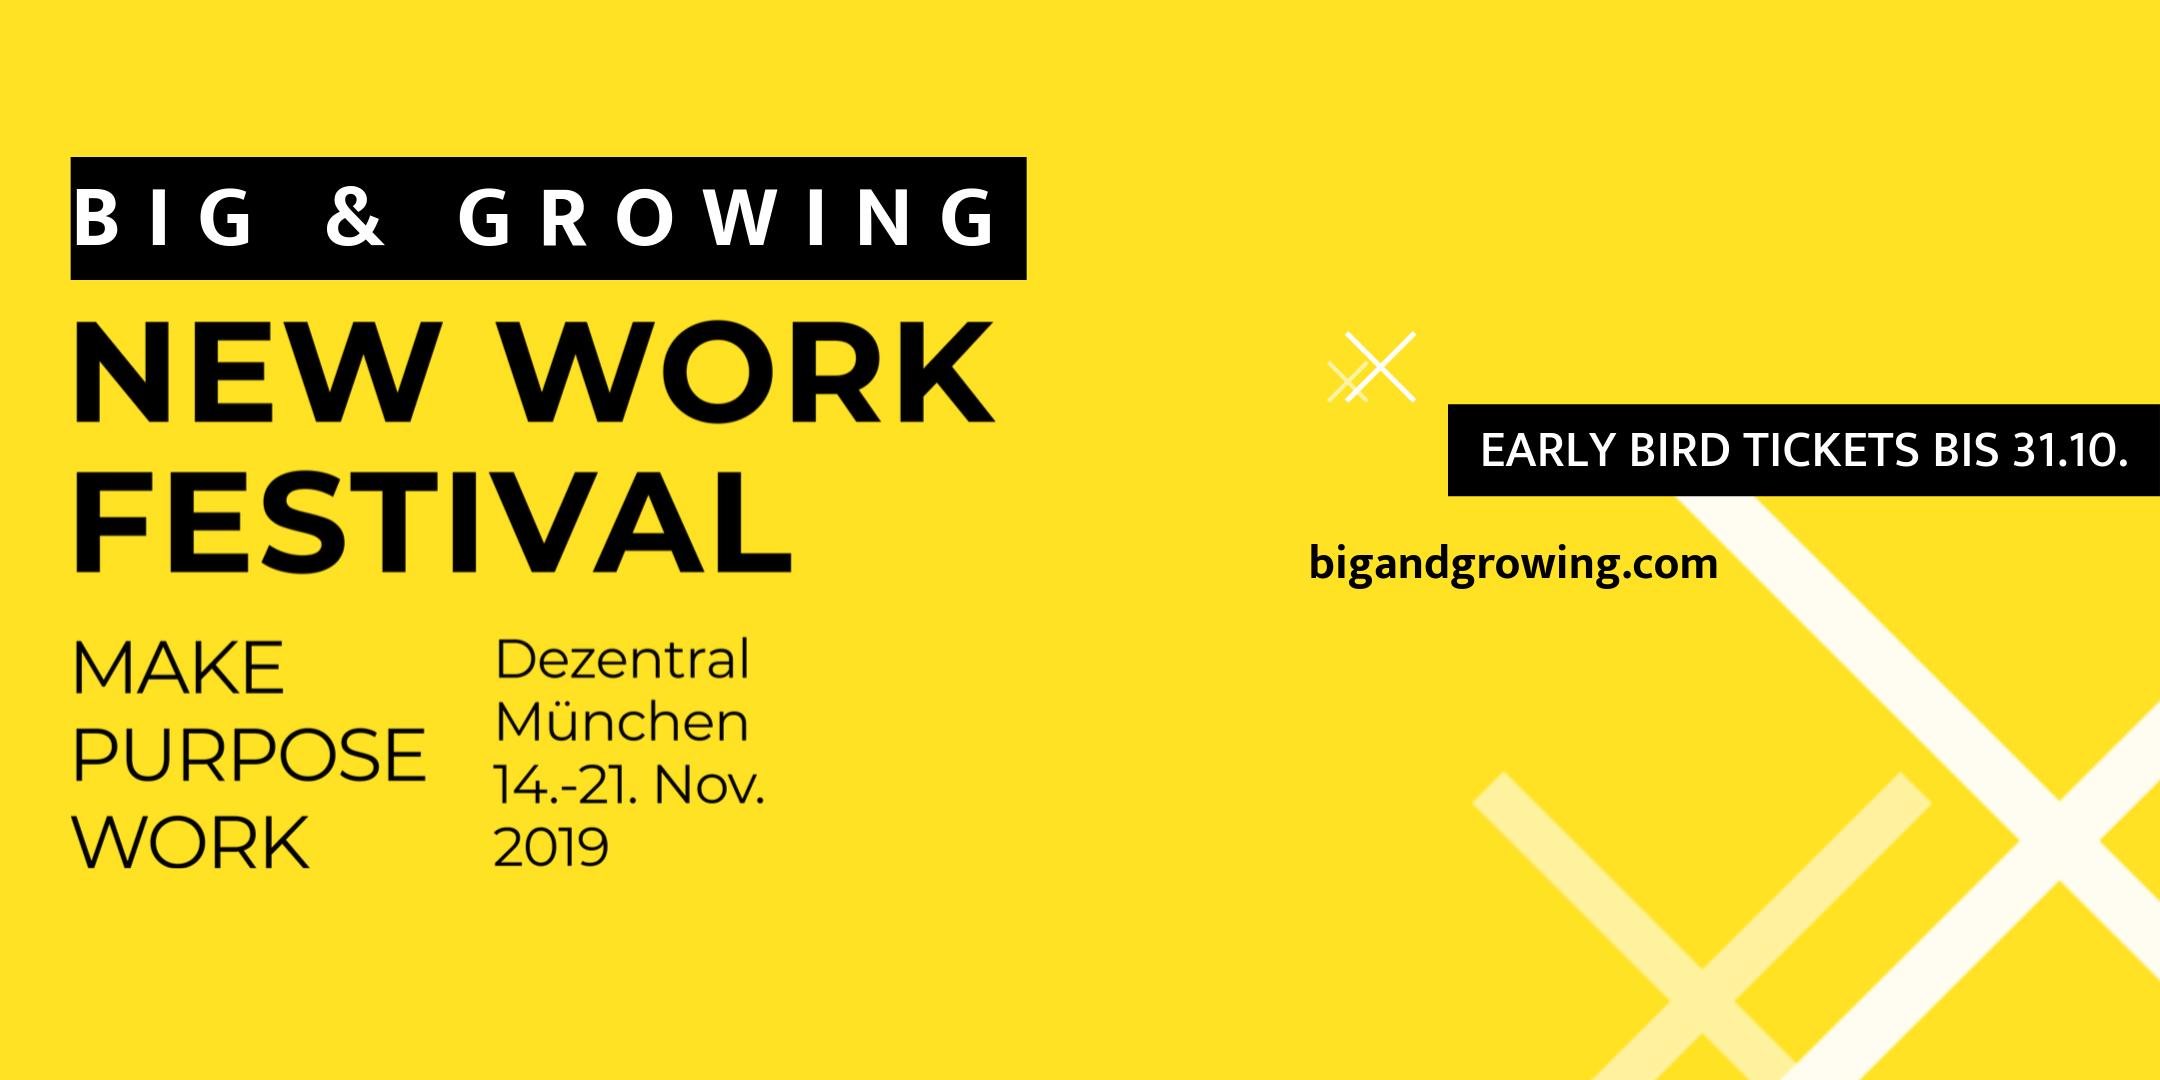 Big & Growing New Work Festival